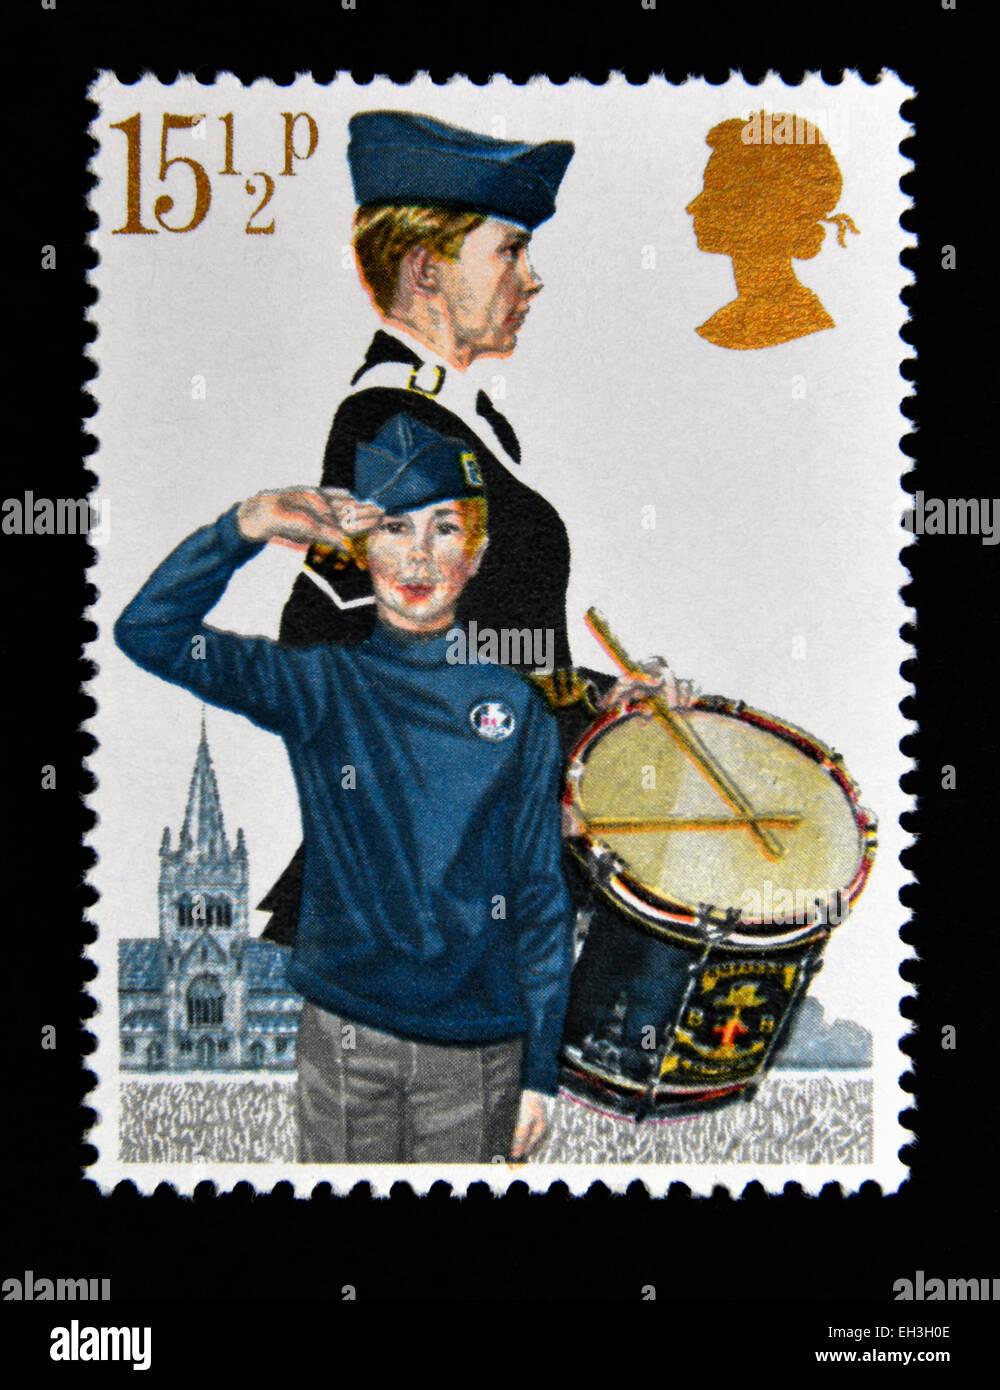 Postage stamp. Great Britain. Queen Elizabeth II. 1982. Youth Organisations. Boys' Brigade. - Stock Image